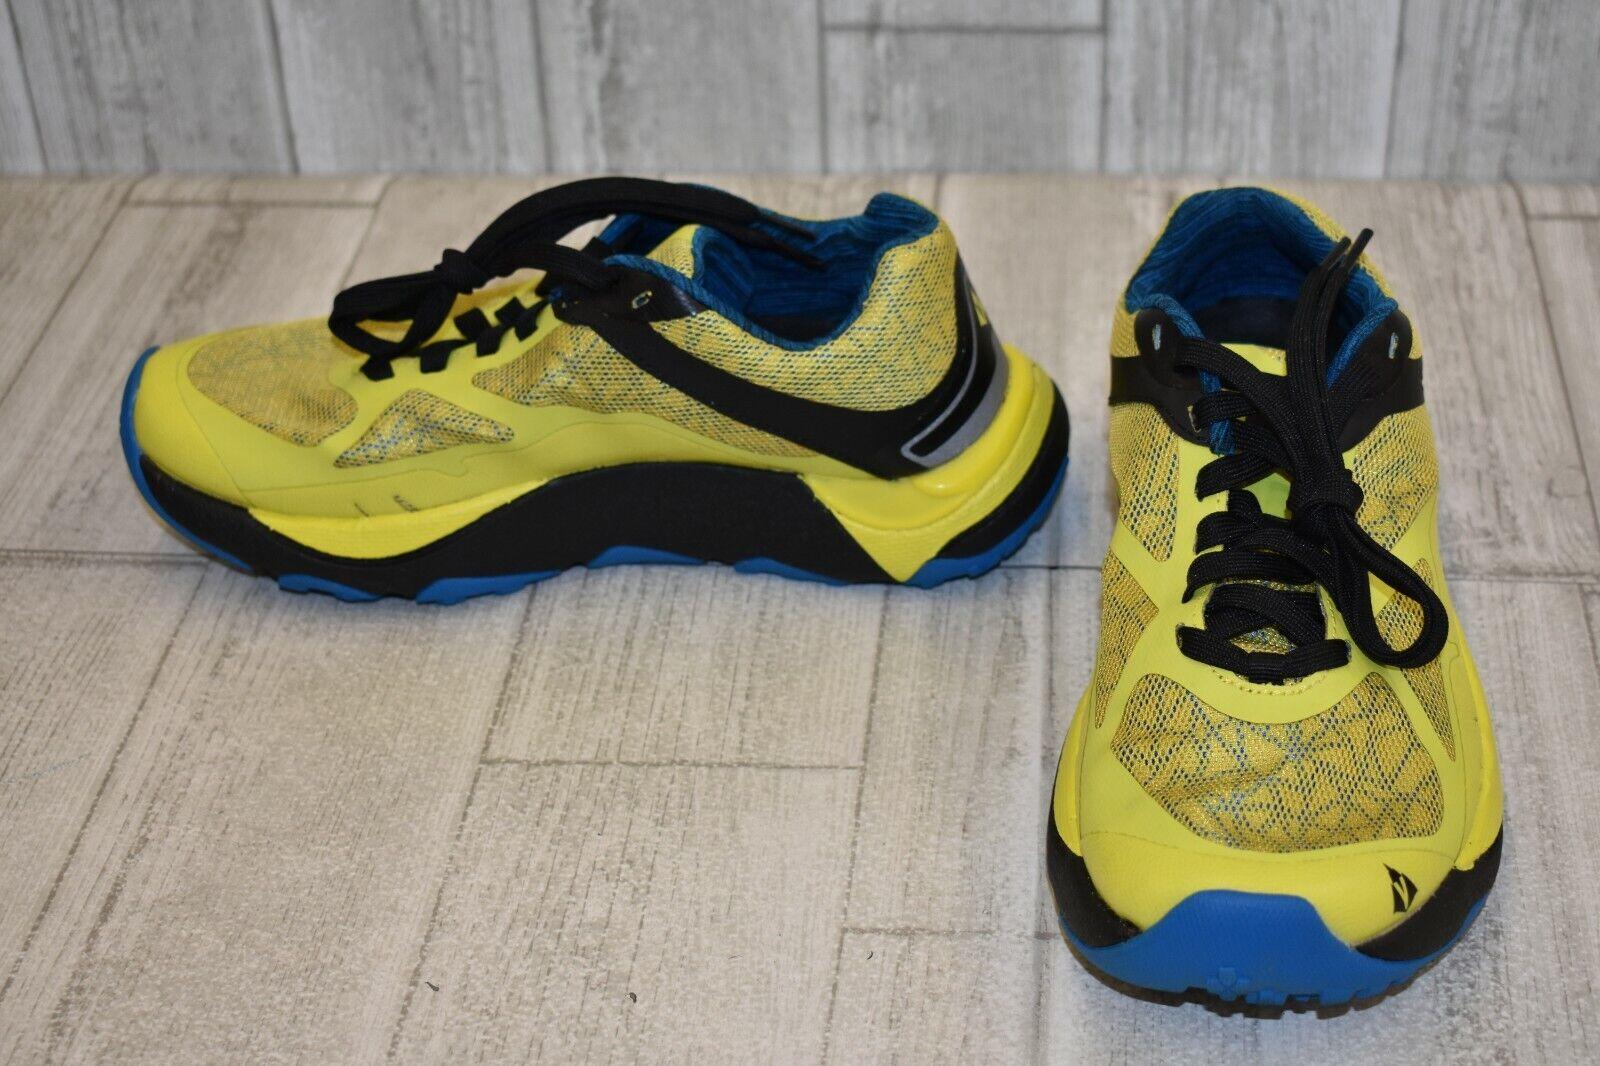 Vasque 7660 Trailbender Trail Running Zapatos, hombres II 's Talla 7.5M, Amarillo Negro